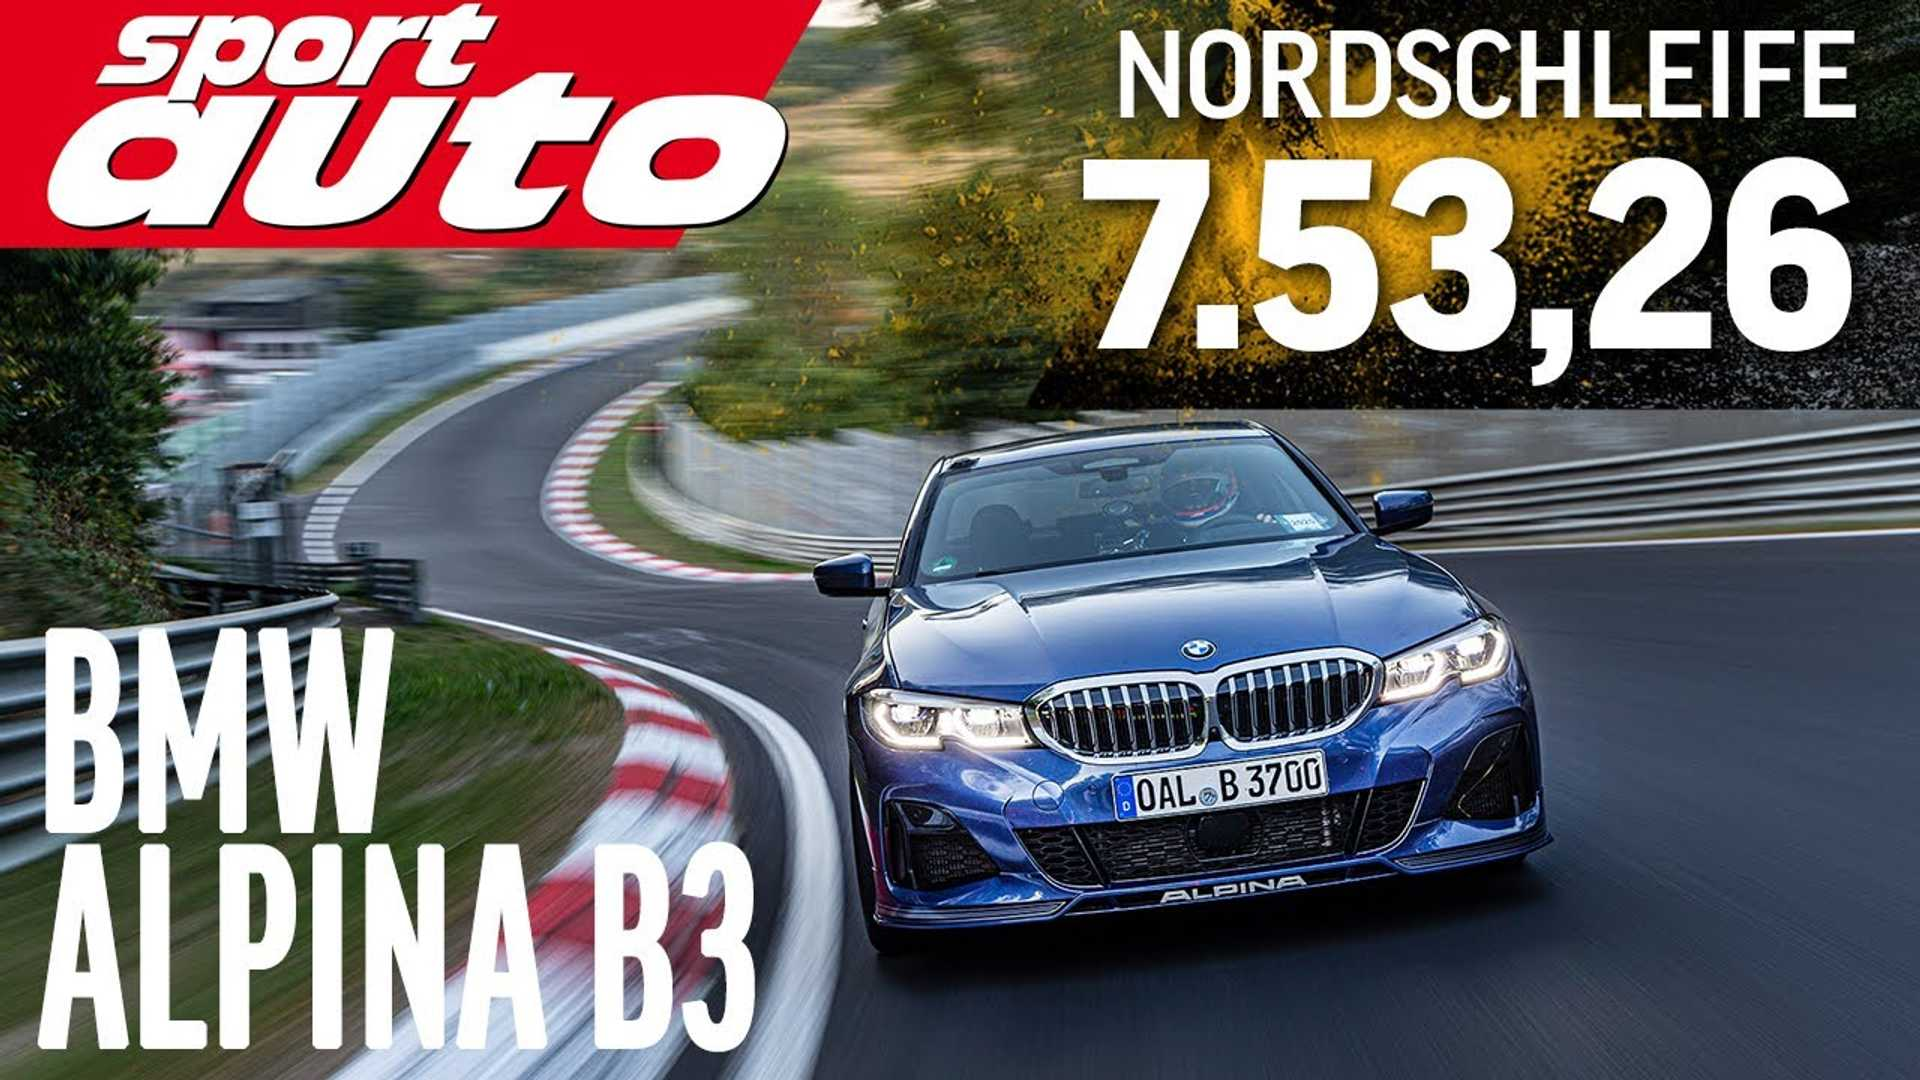 Watch Alpina B3 lap the Nurburgring in 7:53 minutes